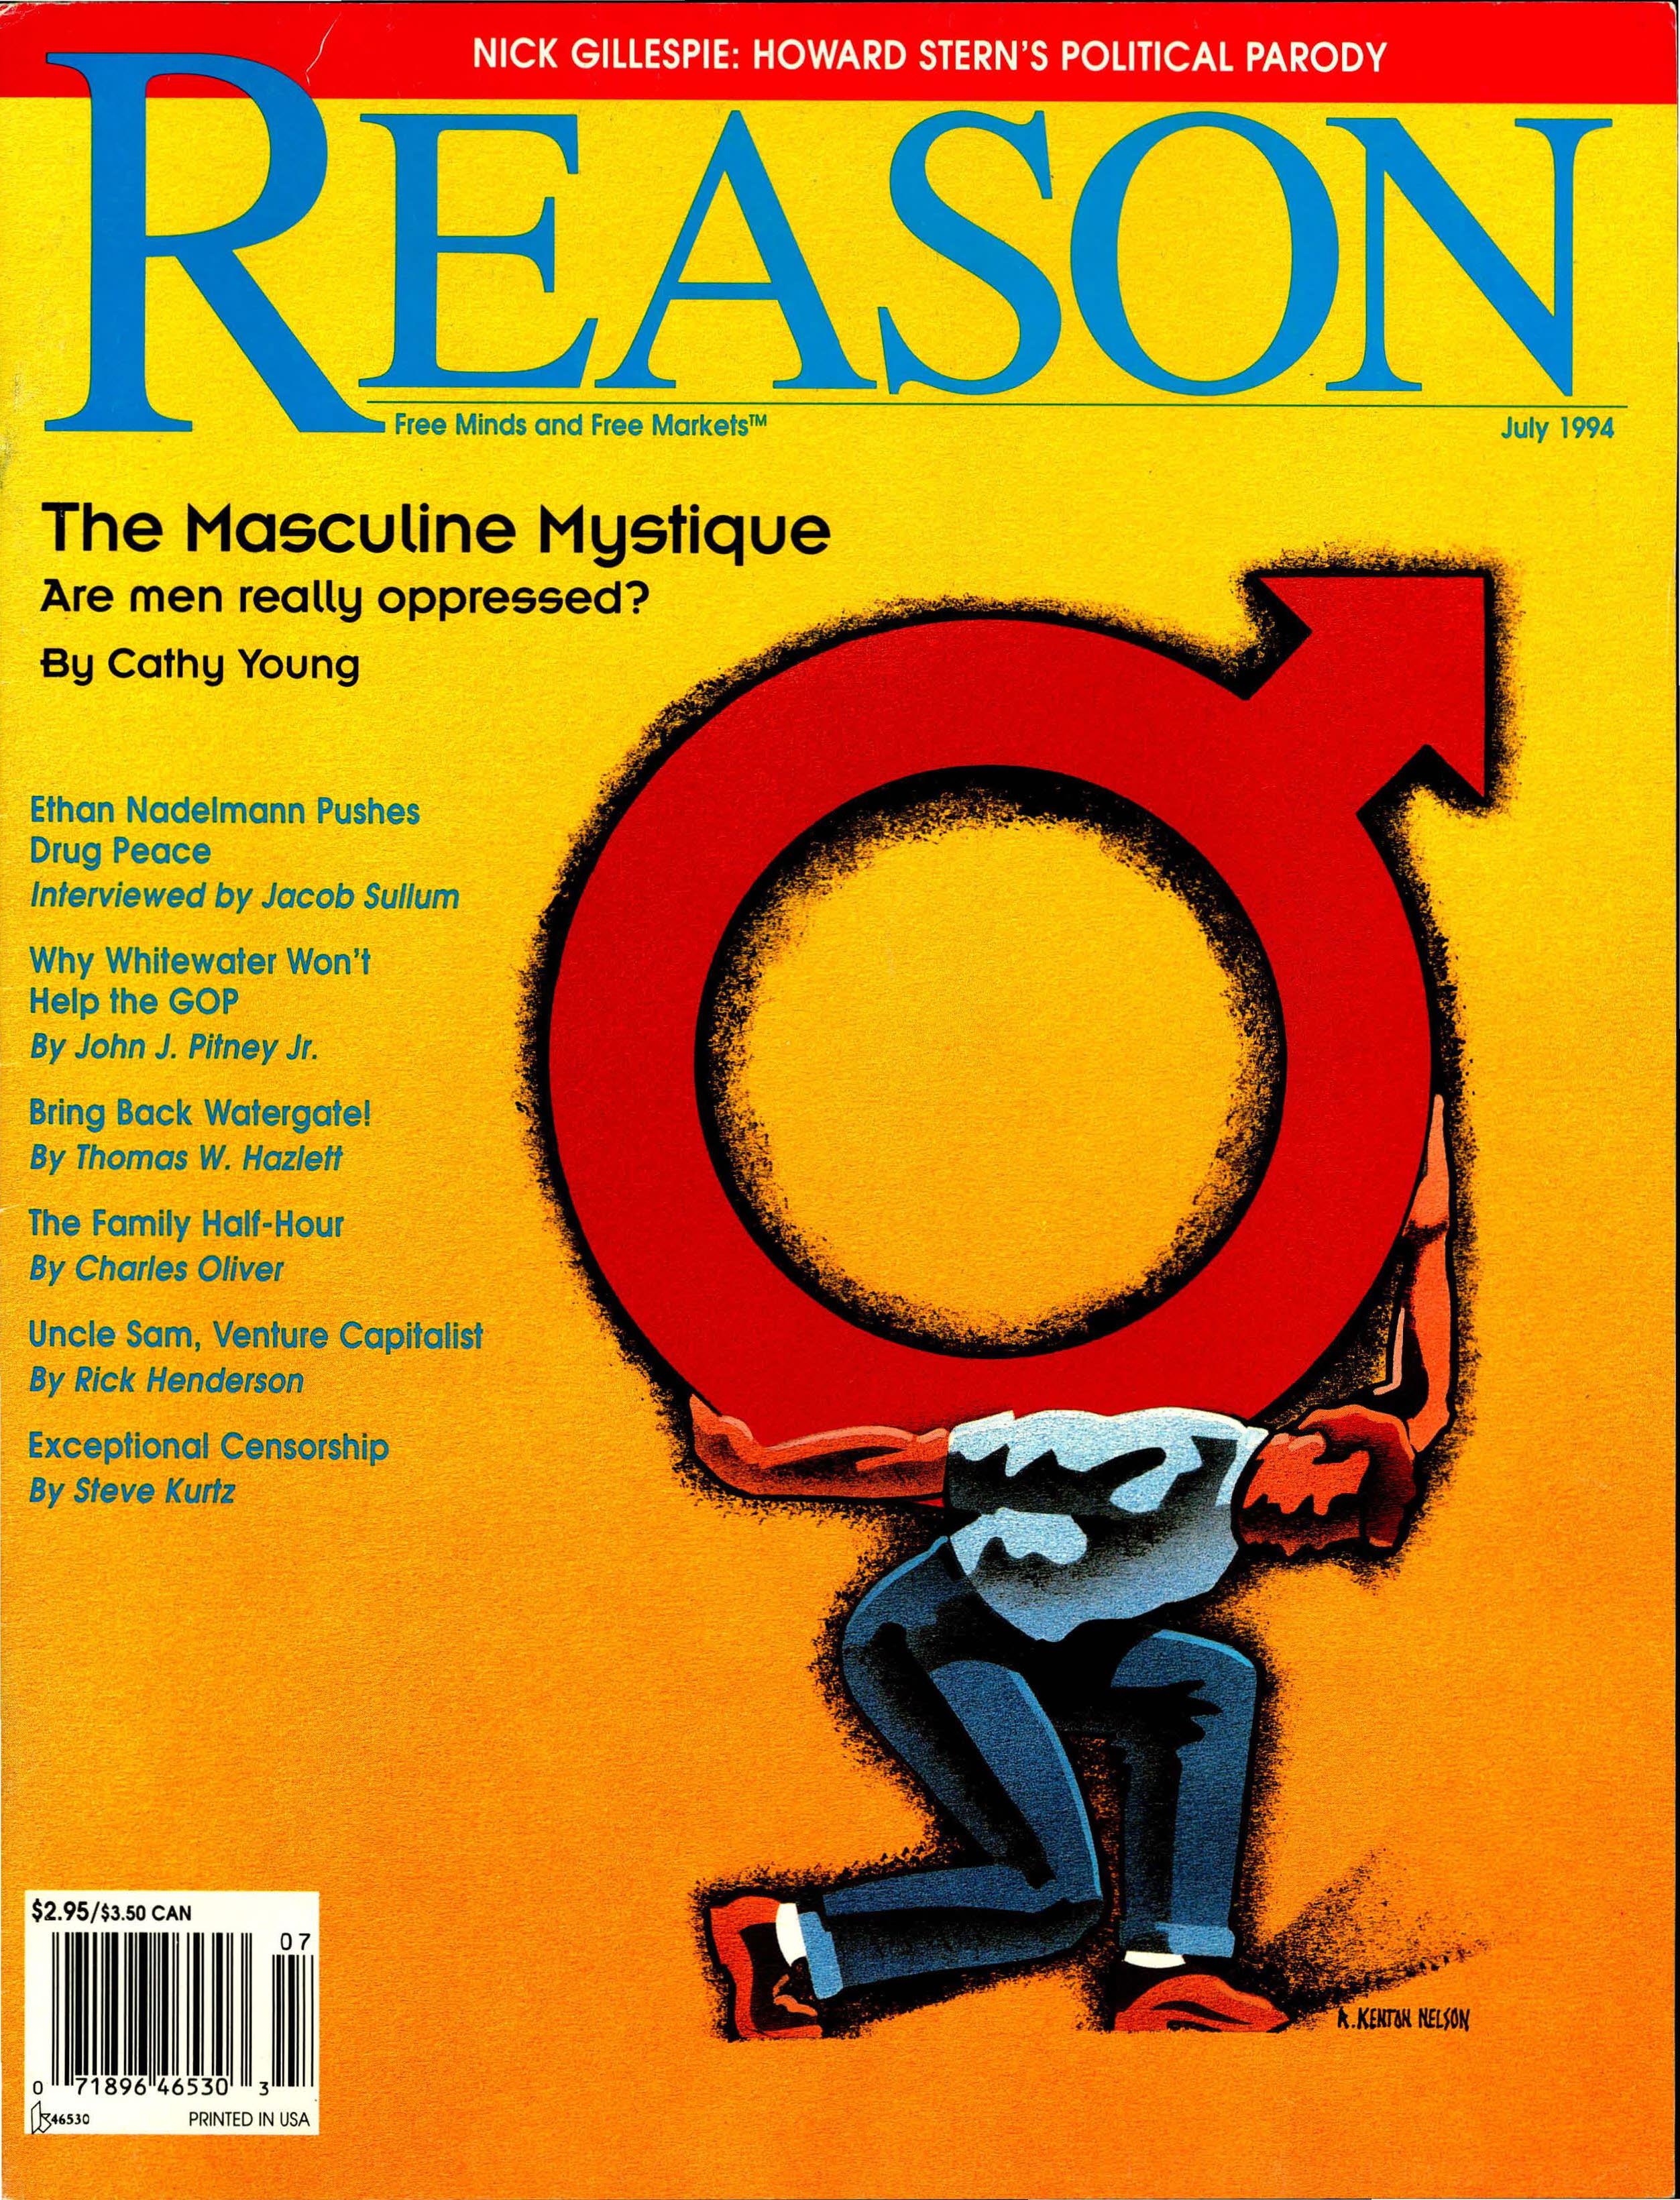 Reason Magazine, July 1994 cover image